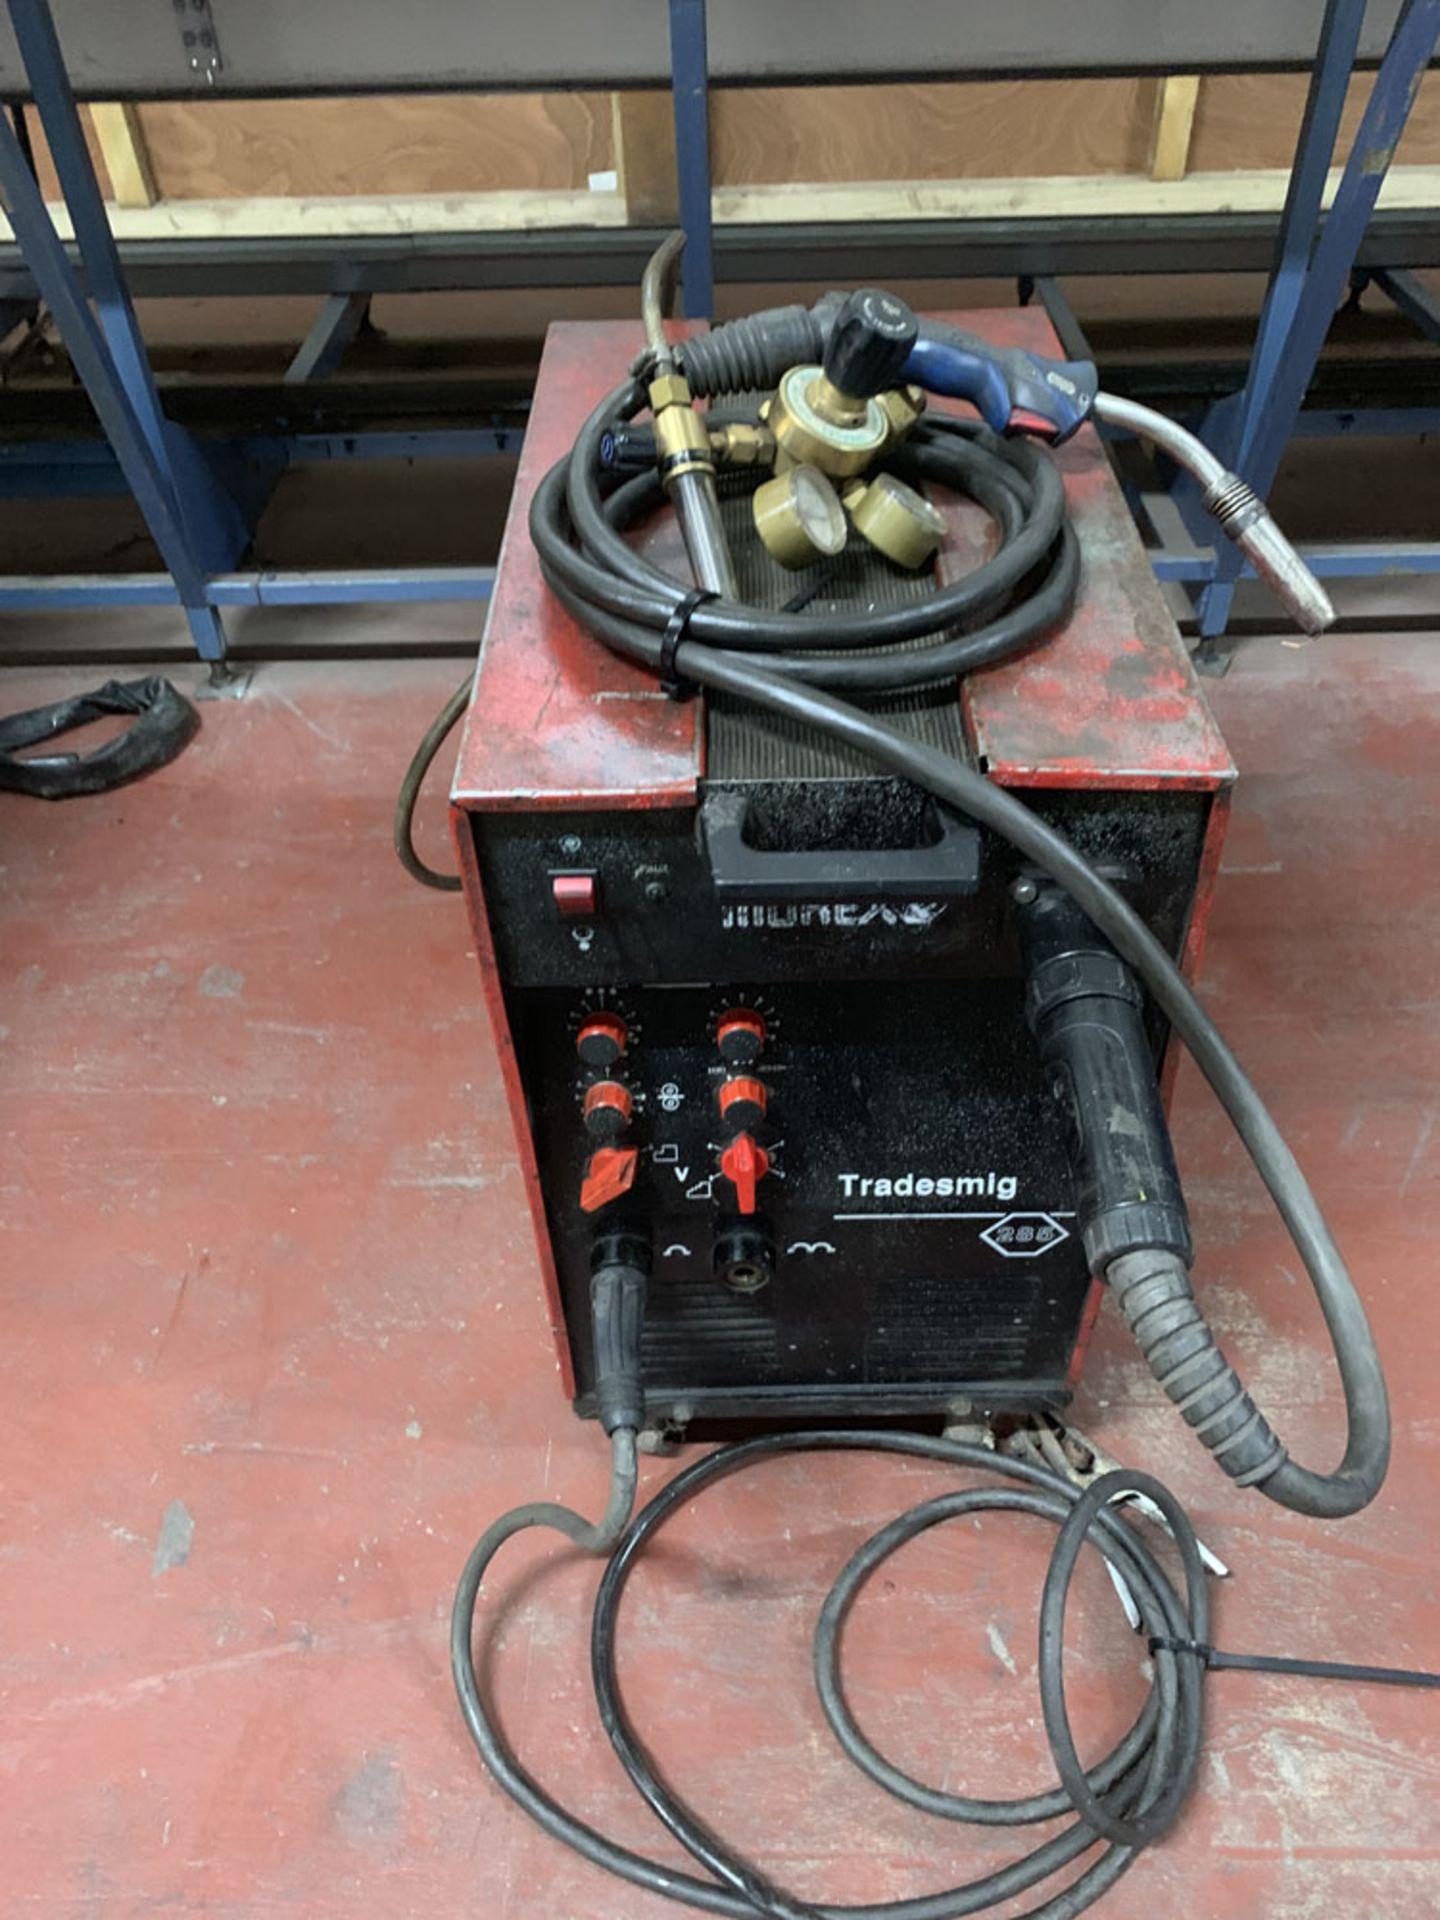 Lot 44 - Murex Tradesmig 285 Welding Unit.